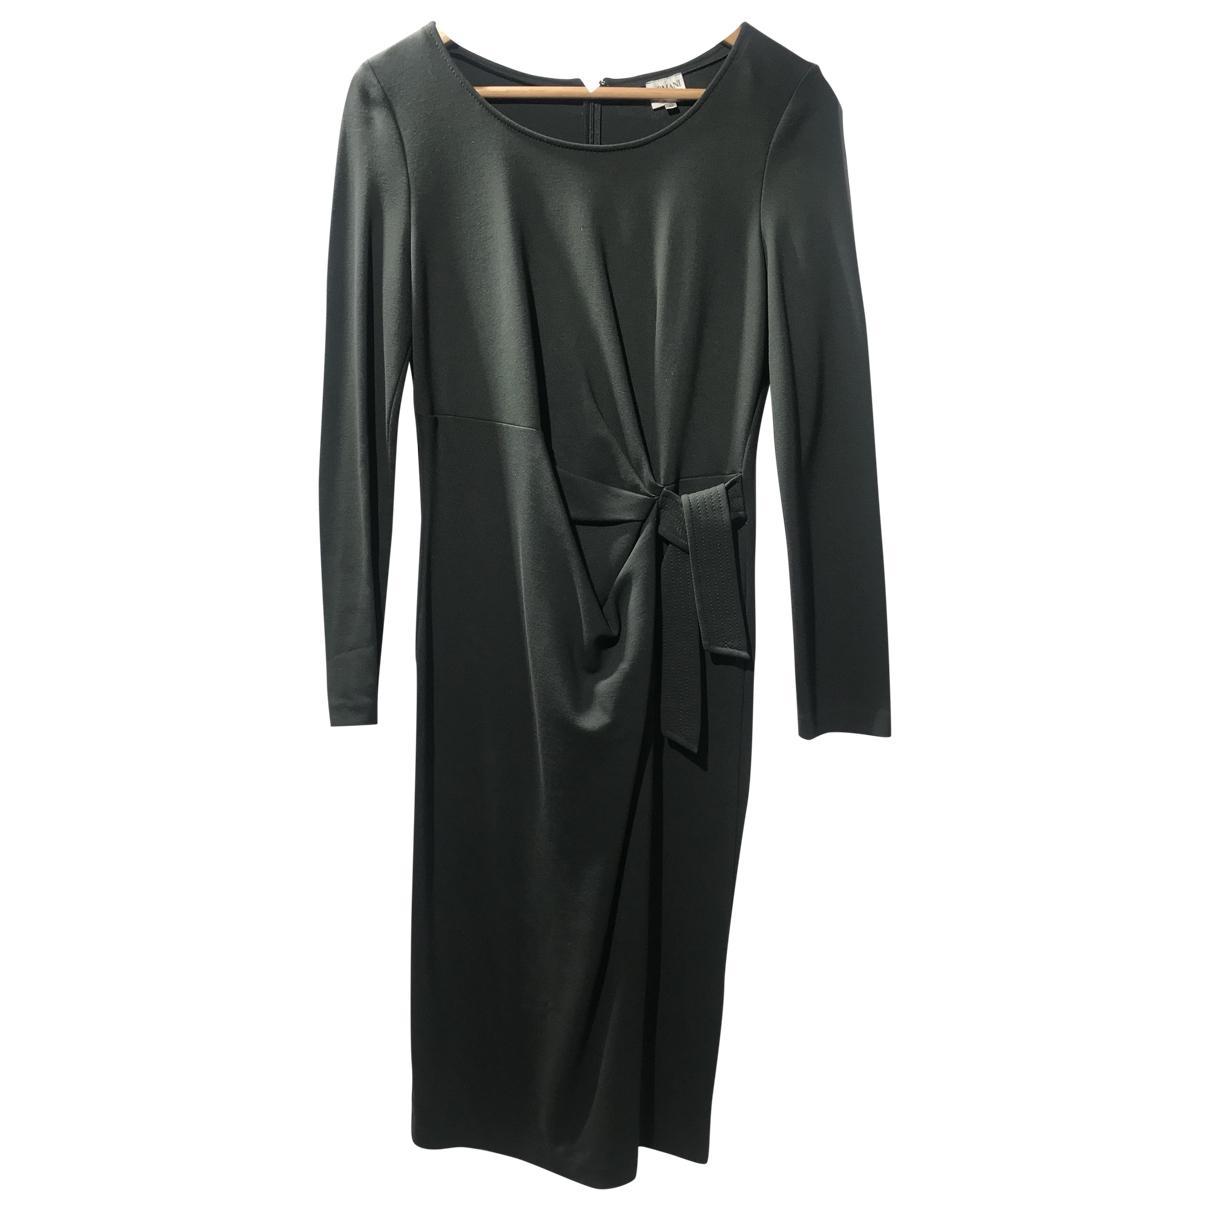 Armani Collezioni \N Green dress for Women 42 IT